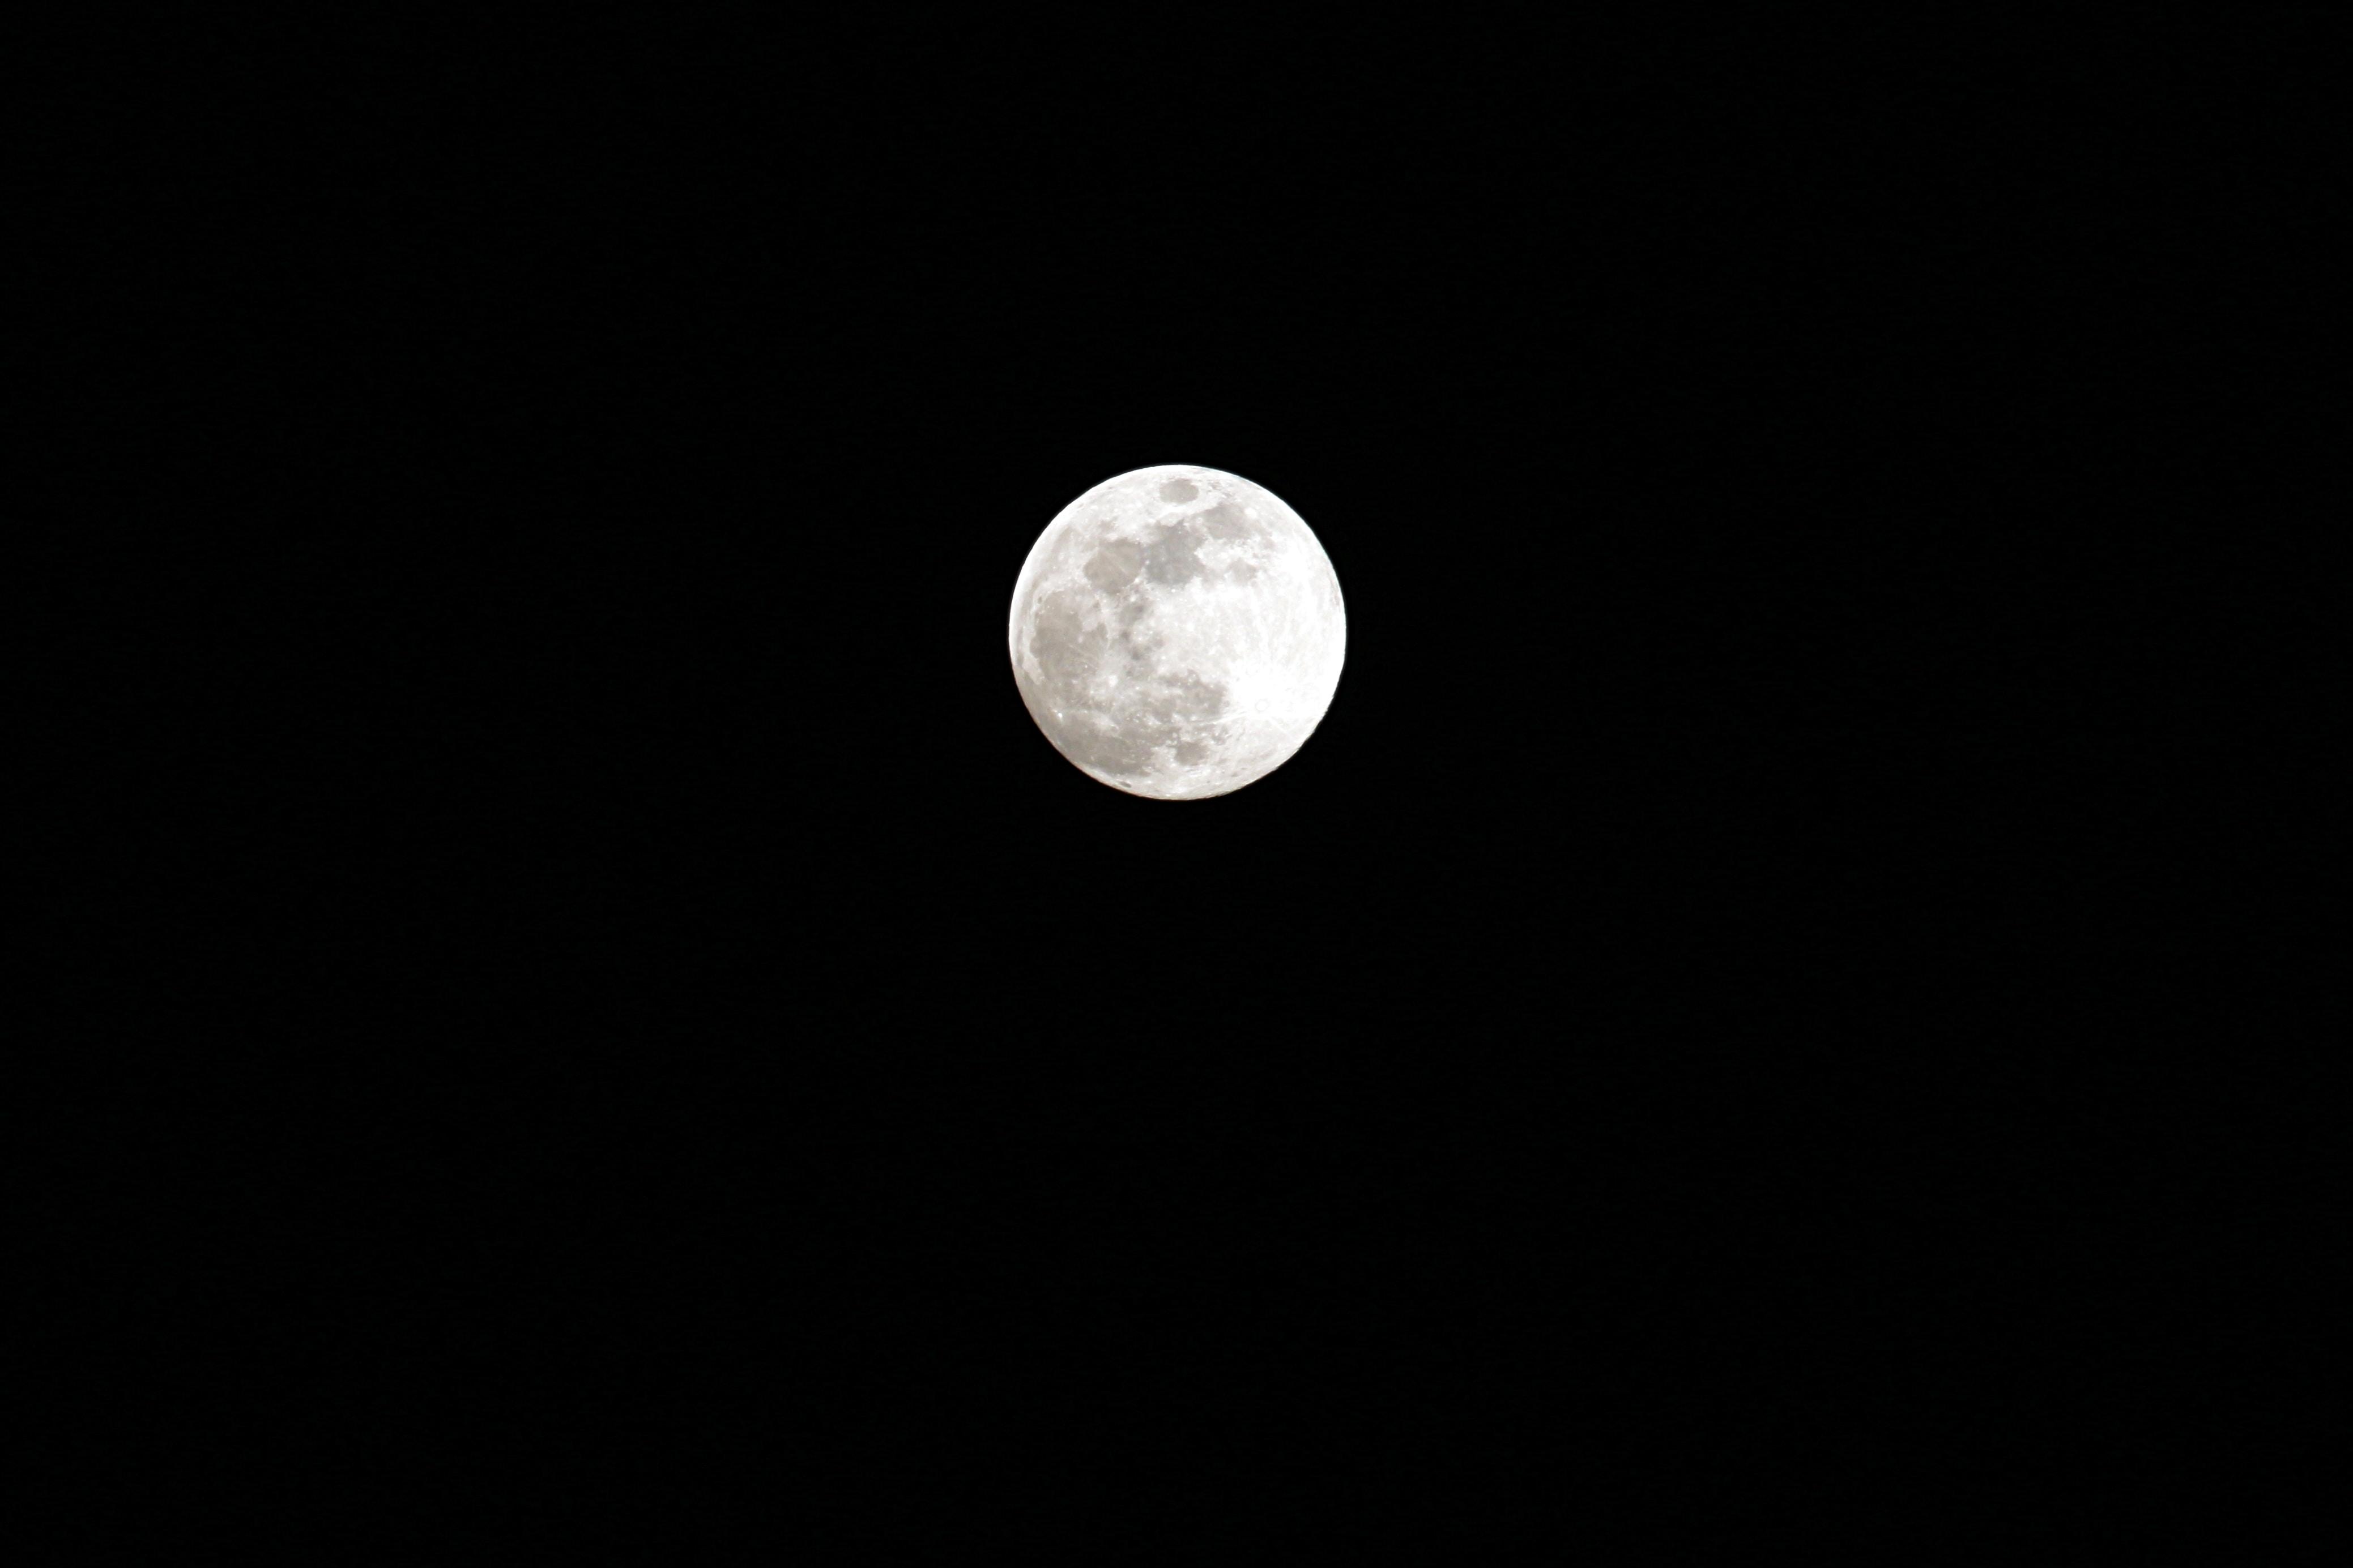 The full moon is seen against the dark night sky